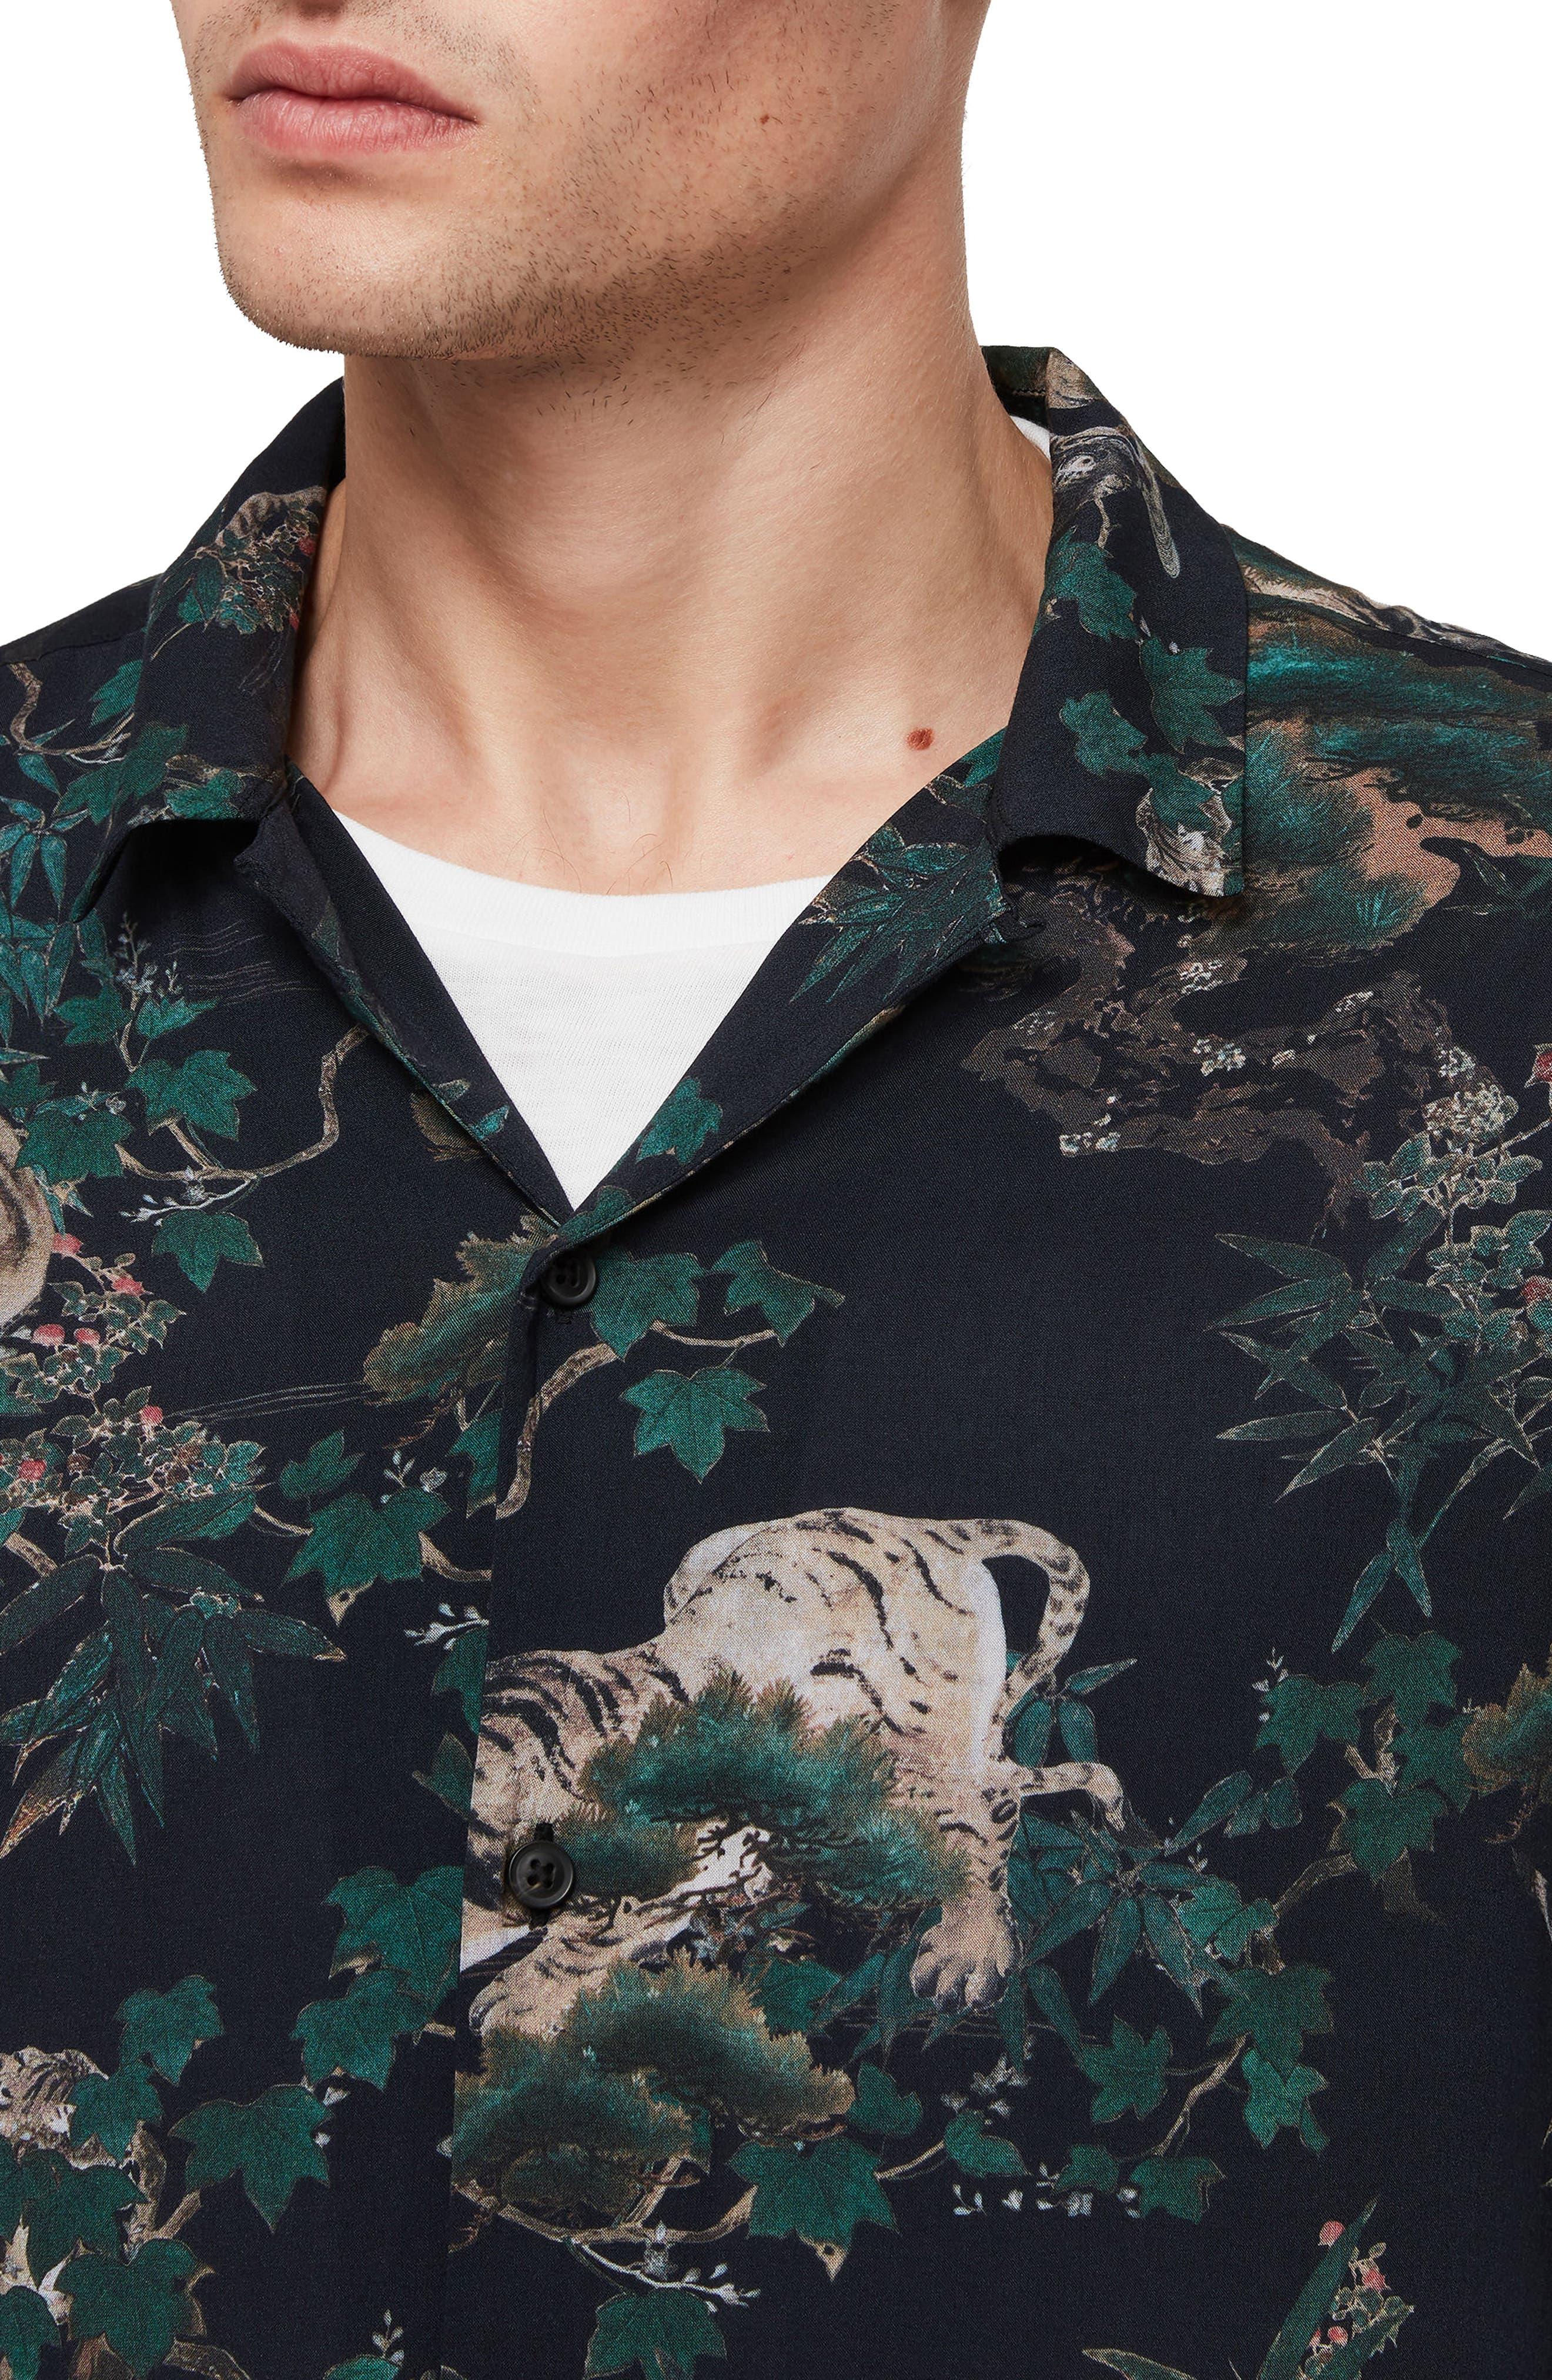 ALLSAINTS, Thicket Tiger Print Sport Shirt, Alternate thumbnail 2, color, 003